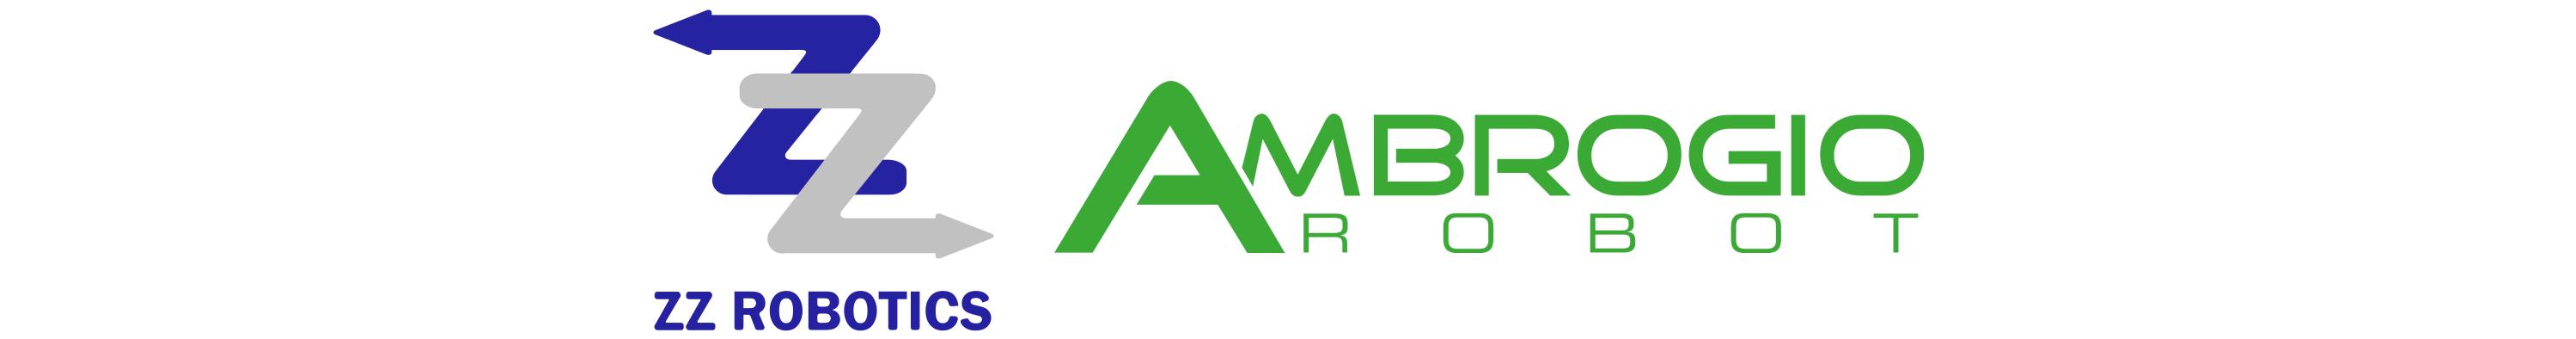 Robotics_Banner